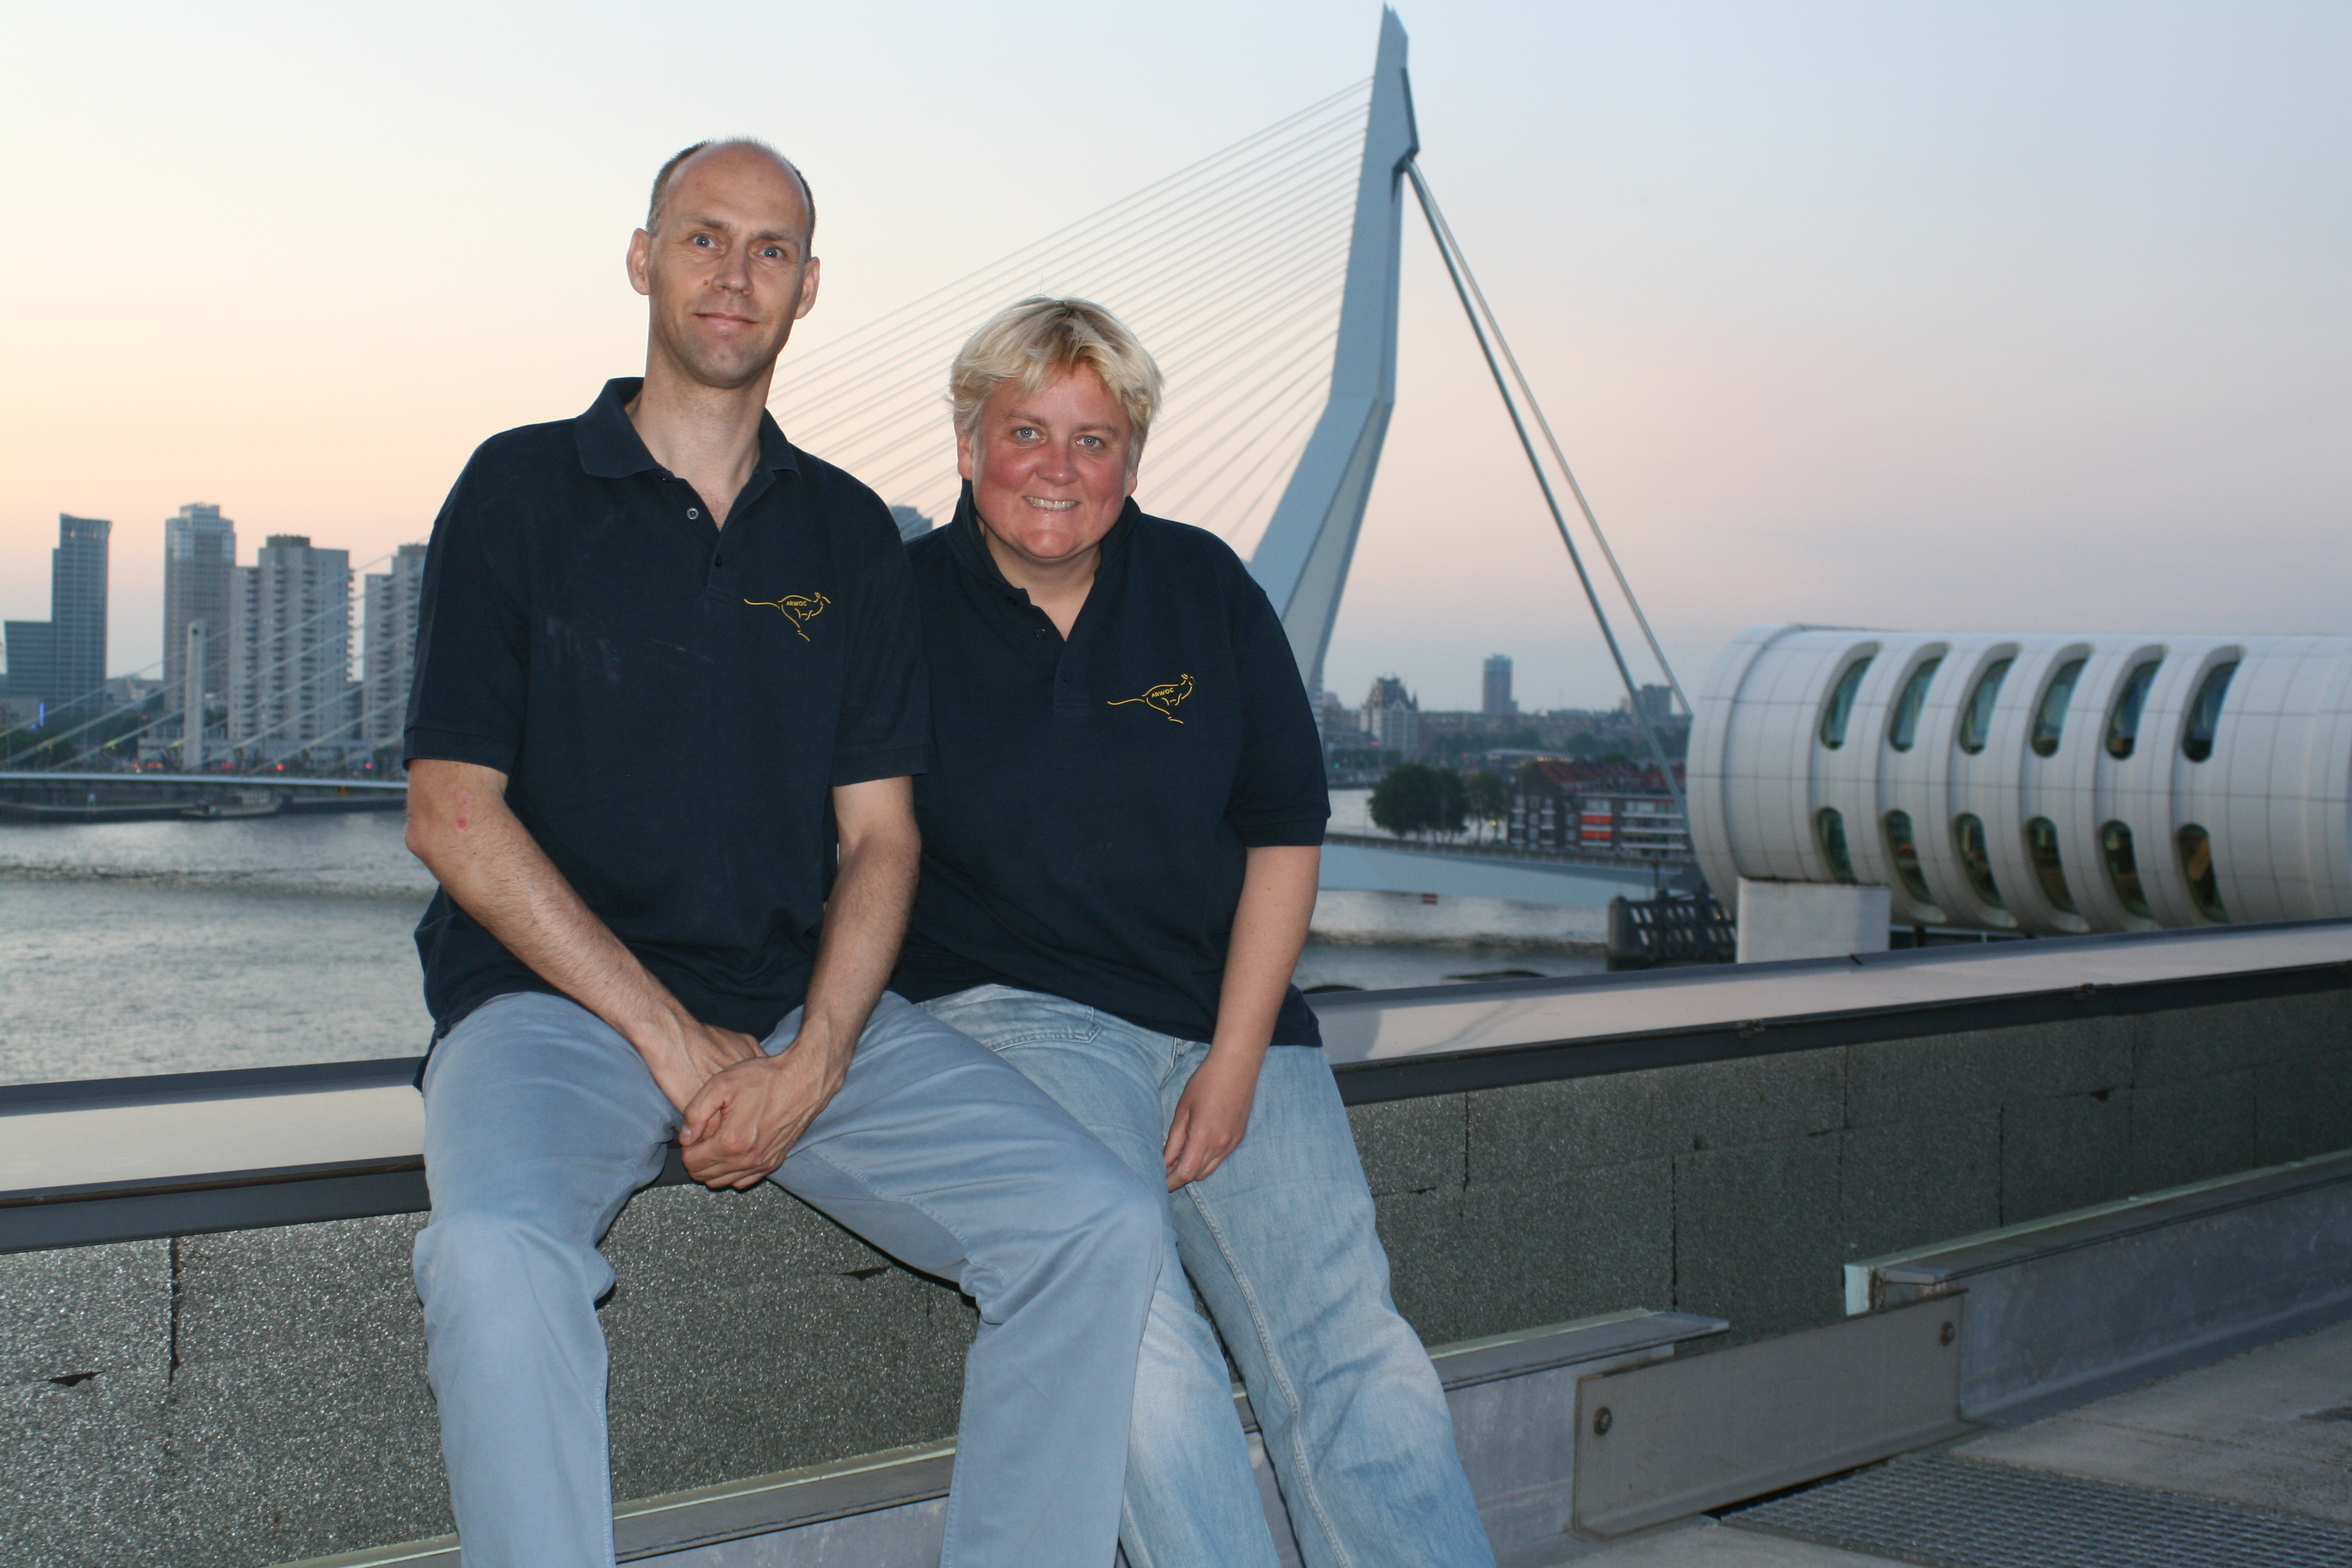 Eduard & Martine Arwoc Member Nr. 87 + 69